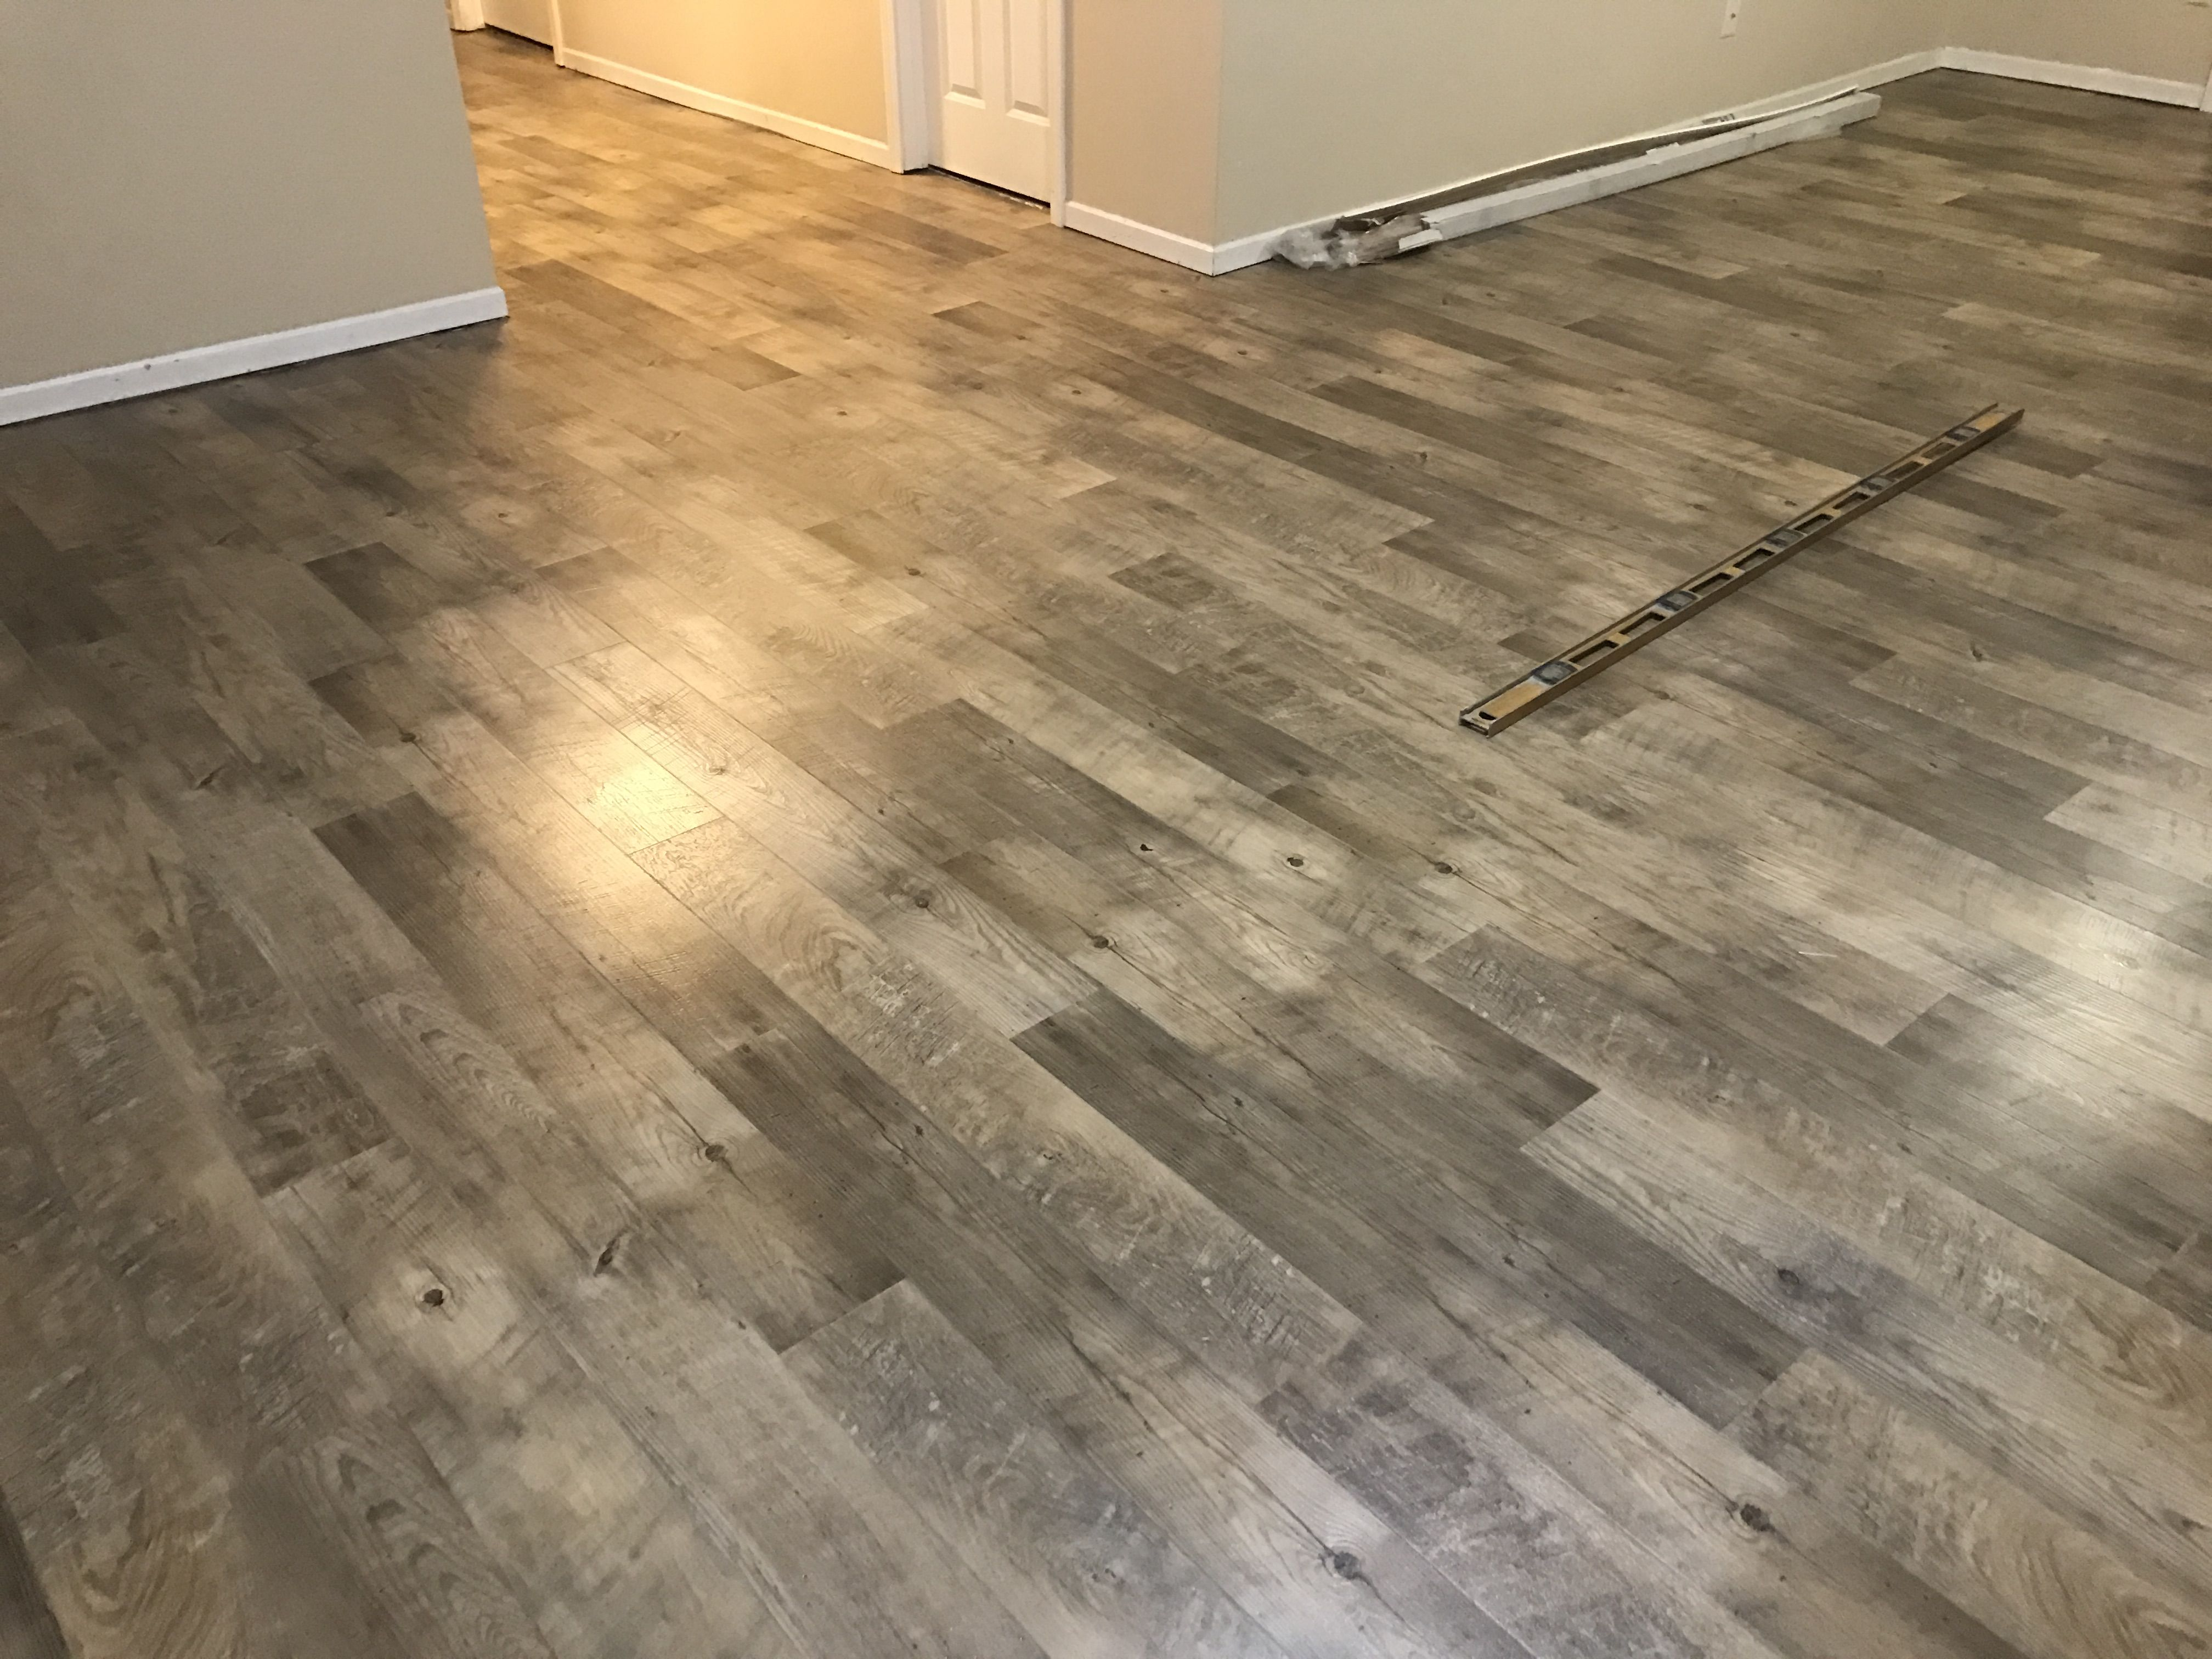 Weathered Pine Installing Vinyl Plank Flooring Vinyl Tile